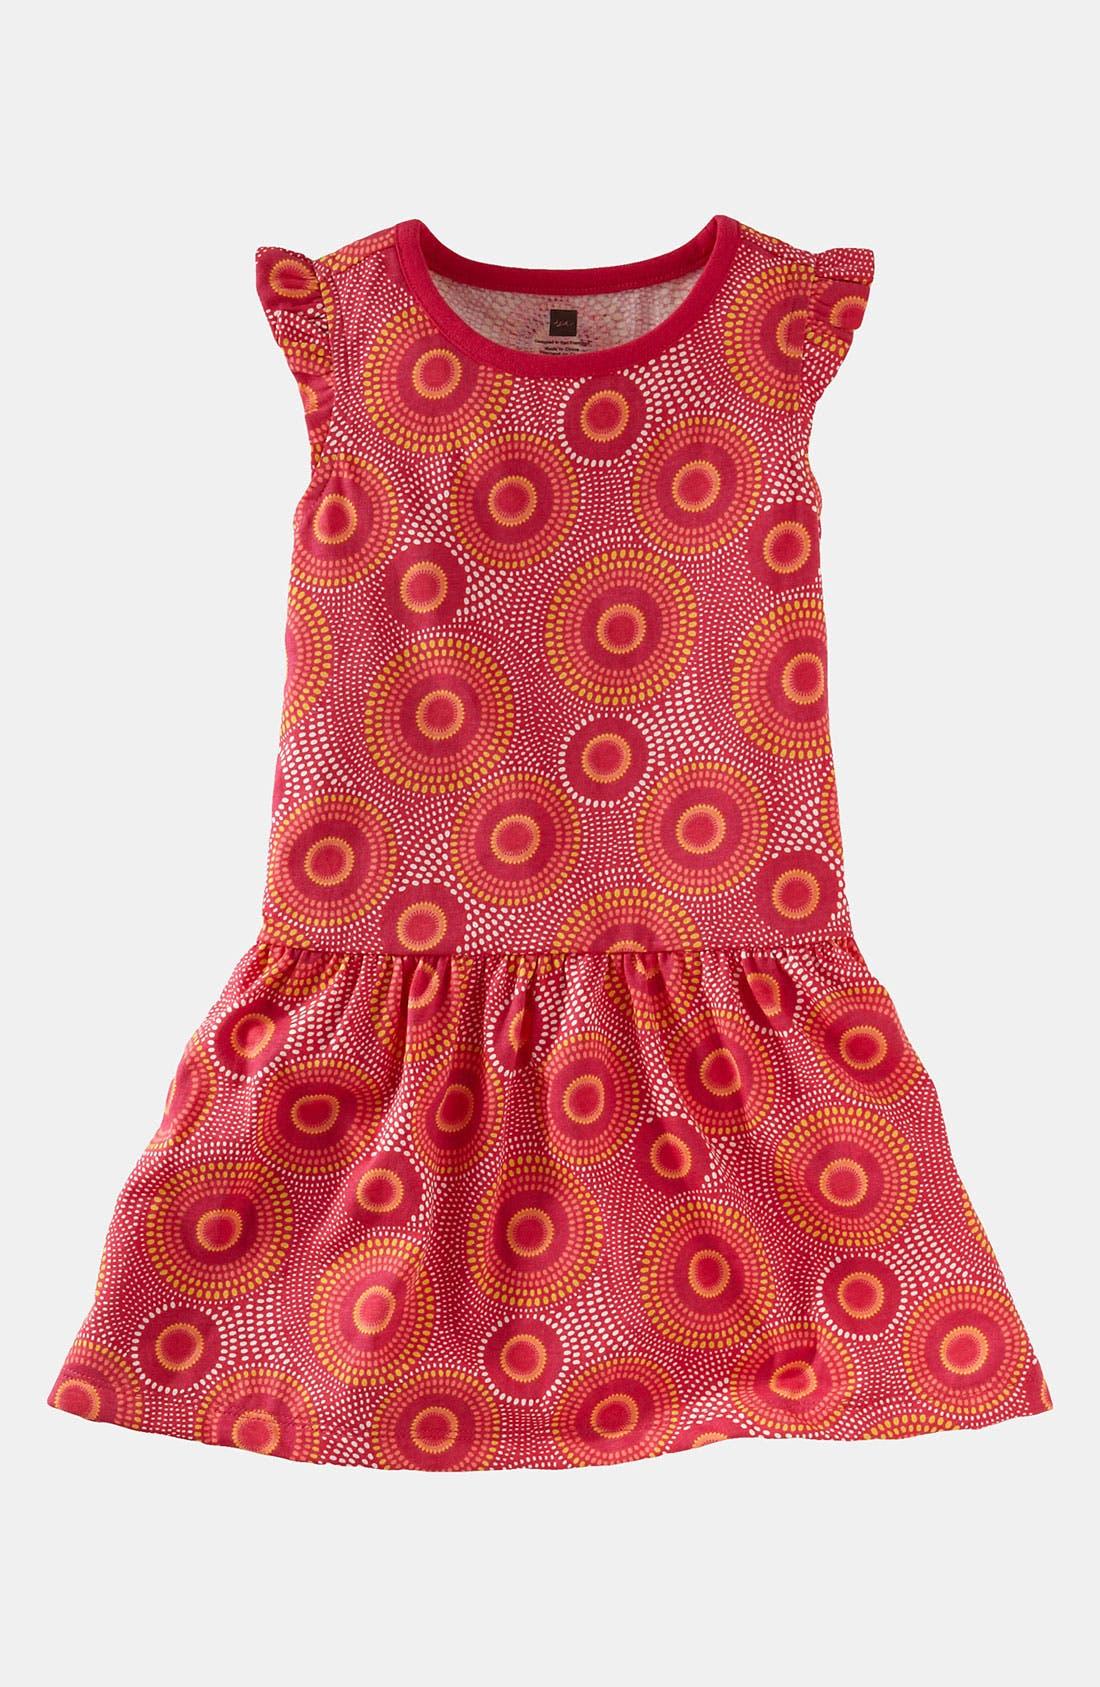 Alternate Image 1 Selected - Tea Collection 'Elm' Flutter Dress (Little Girls & Big Girls)